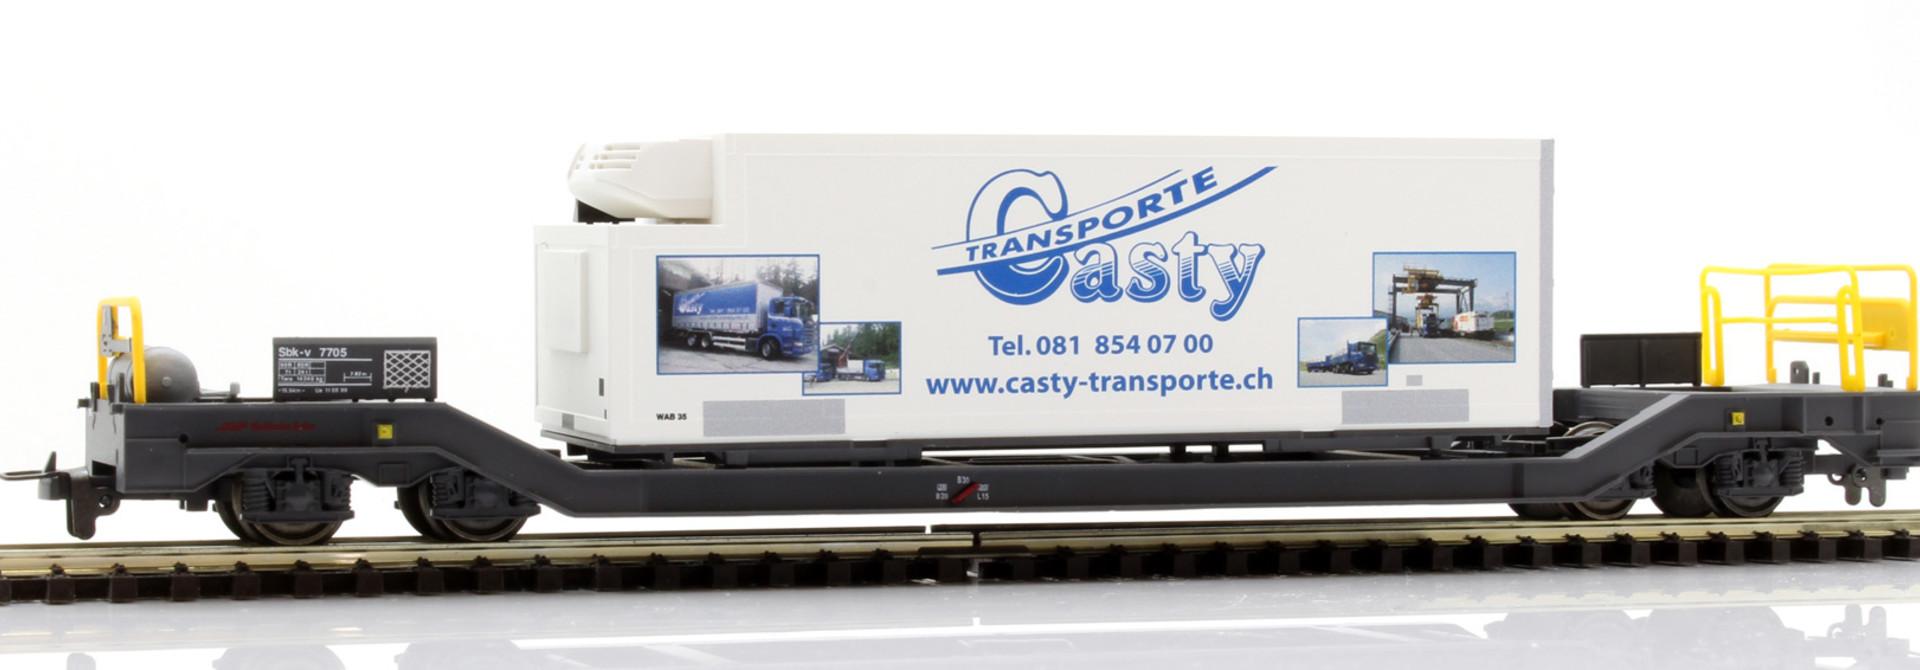 "2289115 RhB Sbk-v 7705 mit Kühlcontainer ""Casty"""